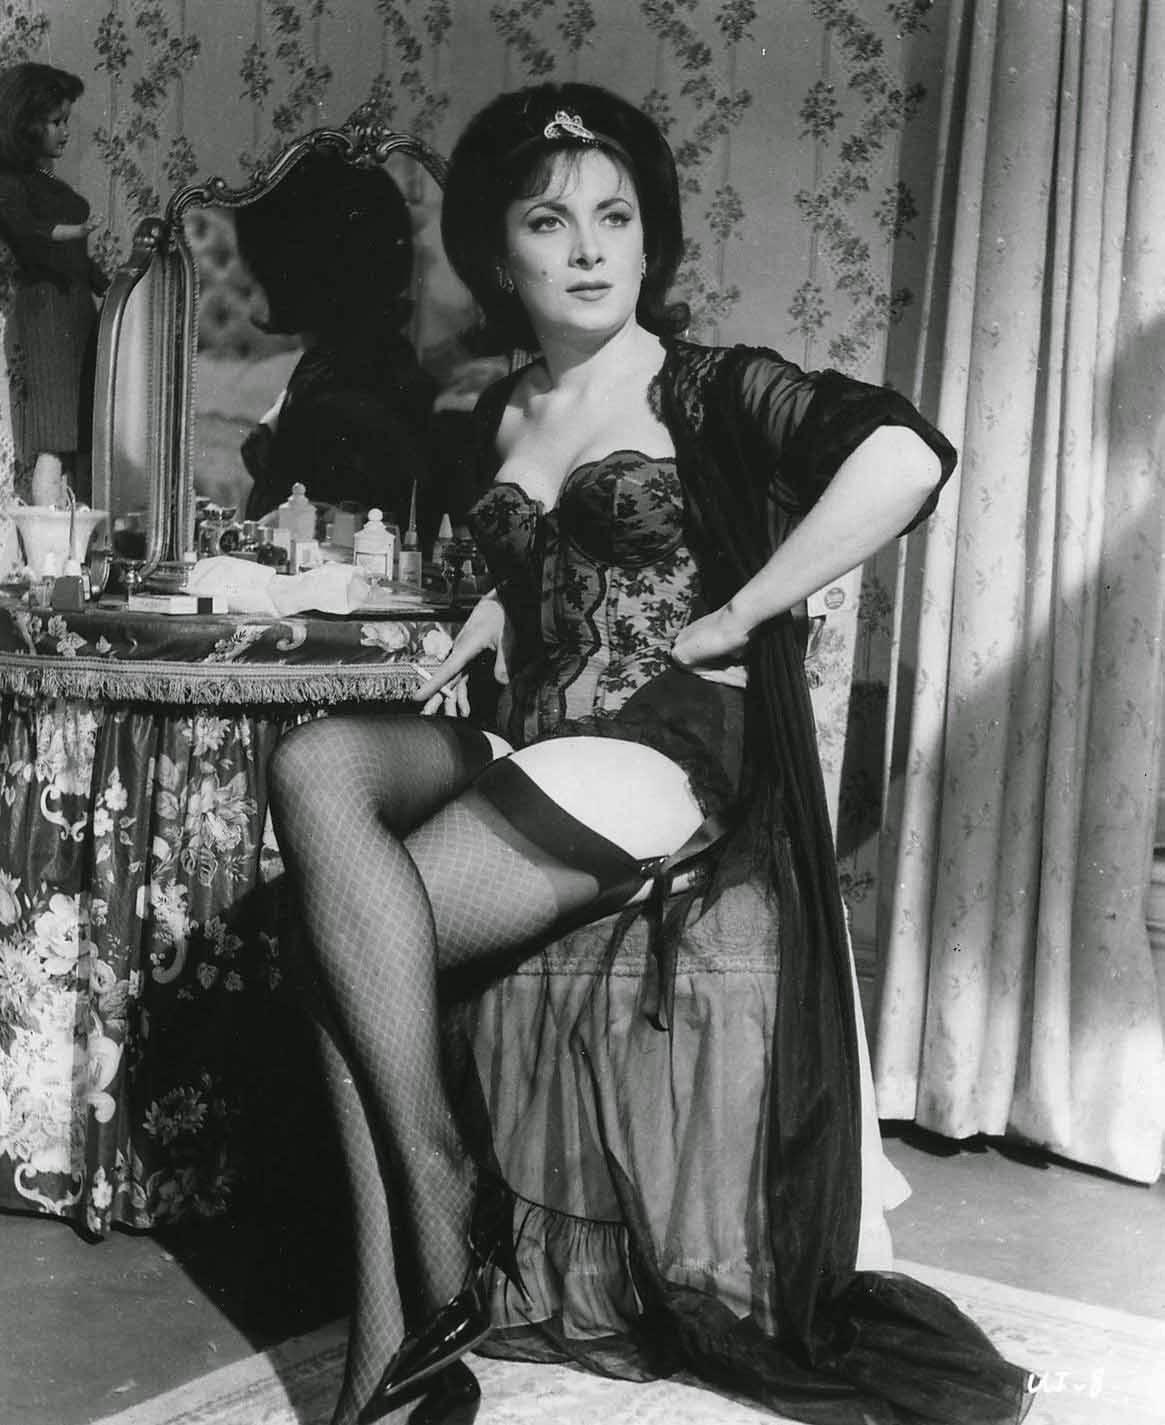 Margaret Whiting in The Informer, 1963 | Ses Rêveries